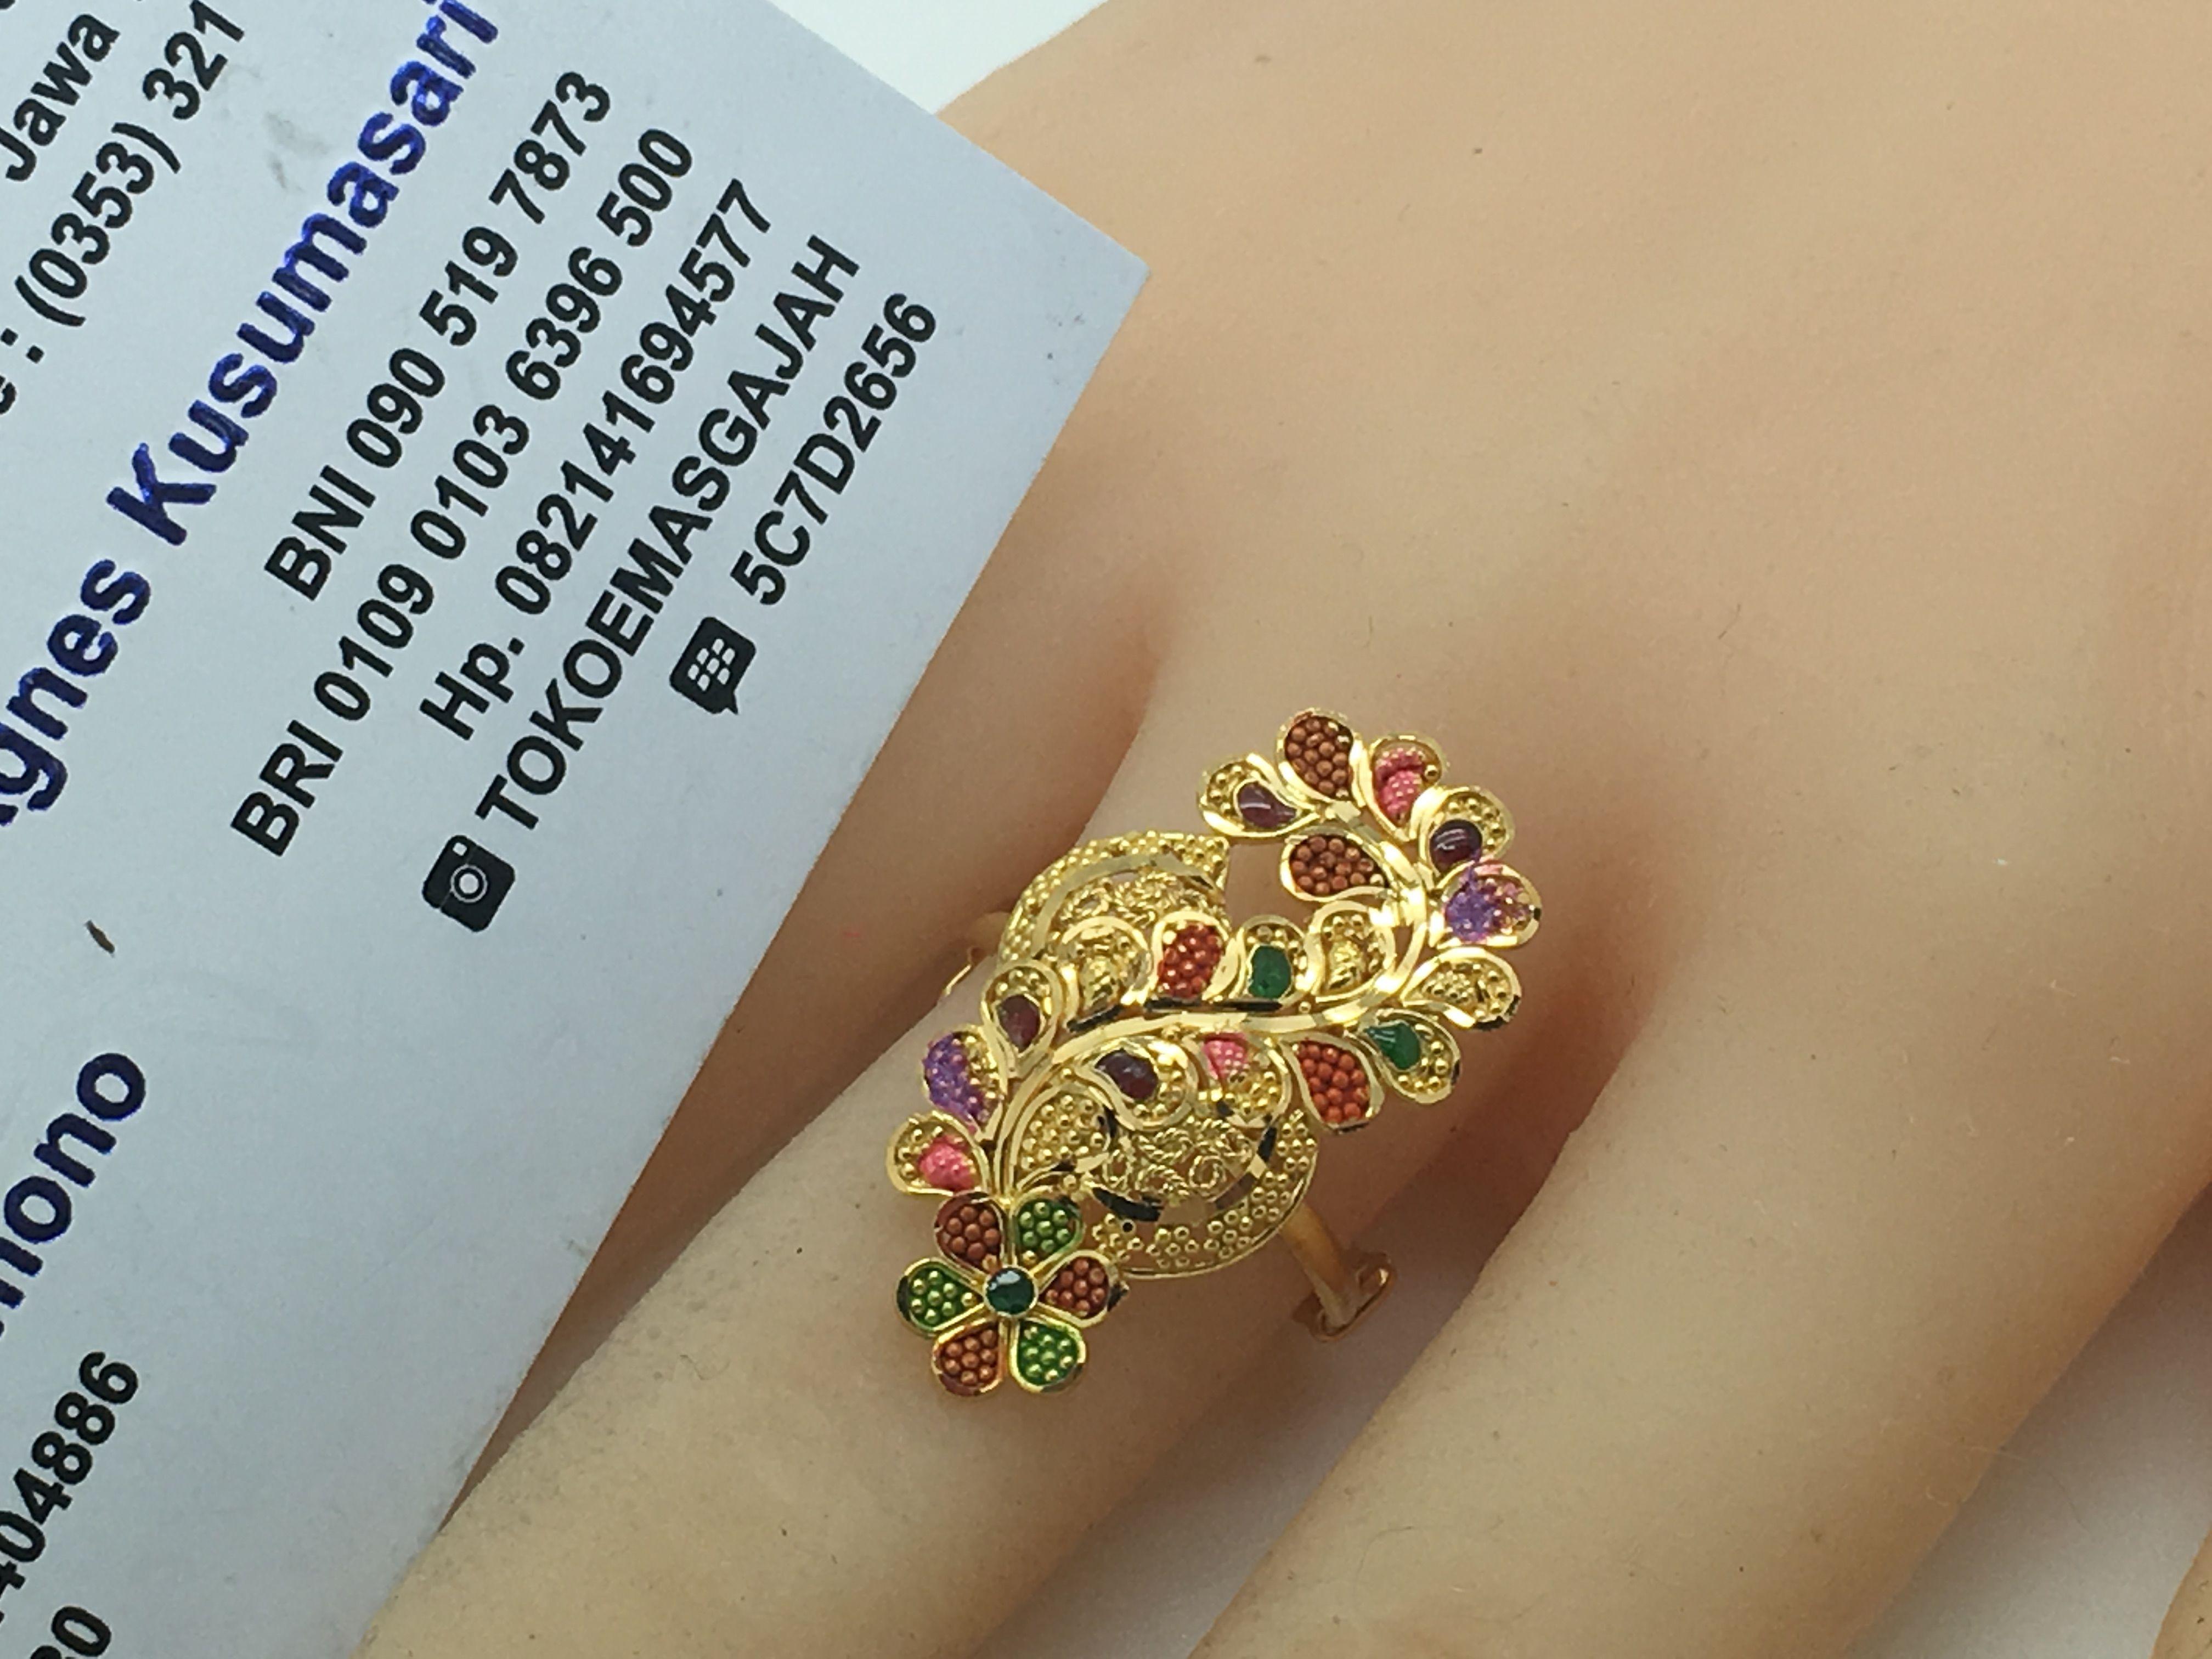 Finding the right menus diamond stud earrings jewellery